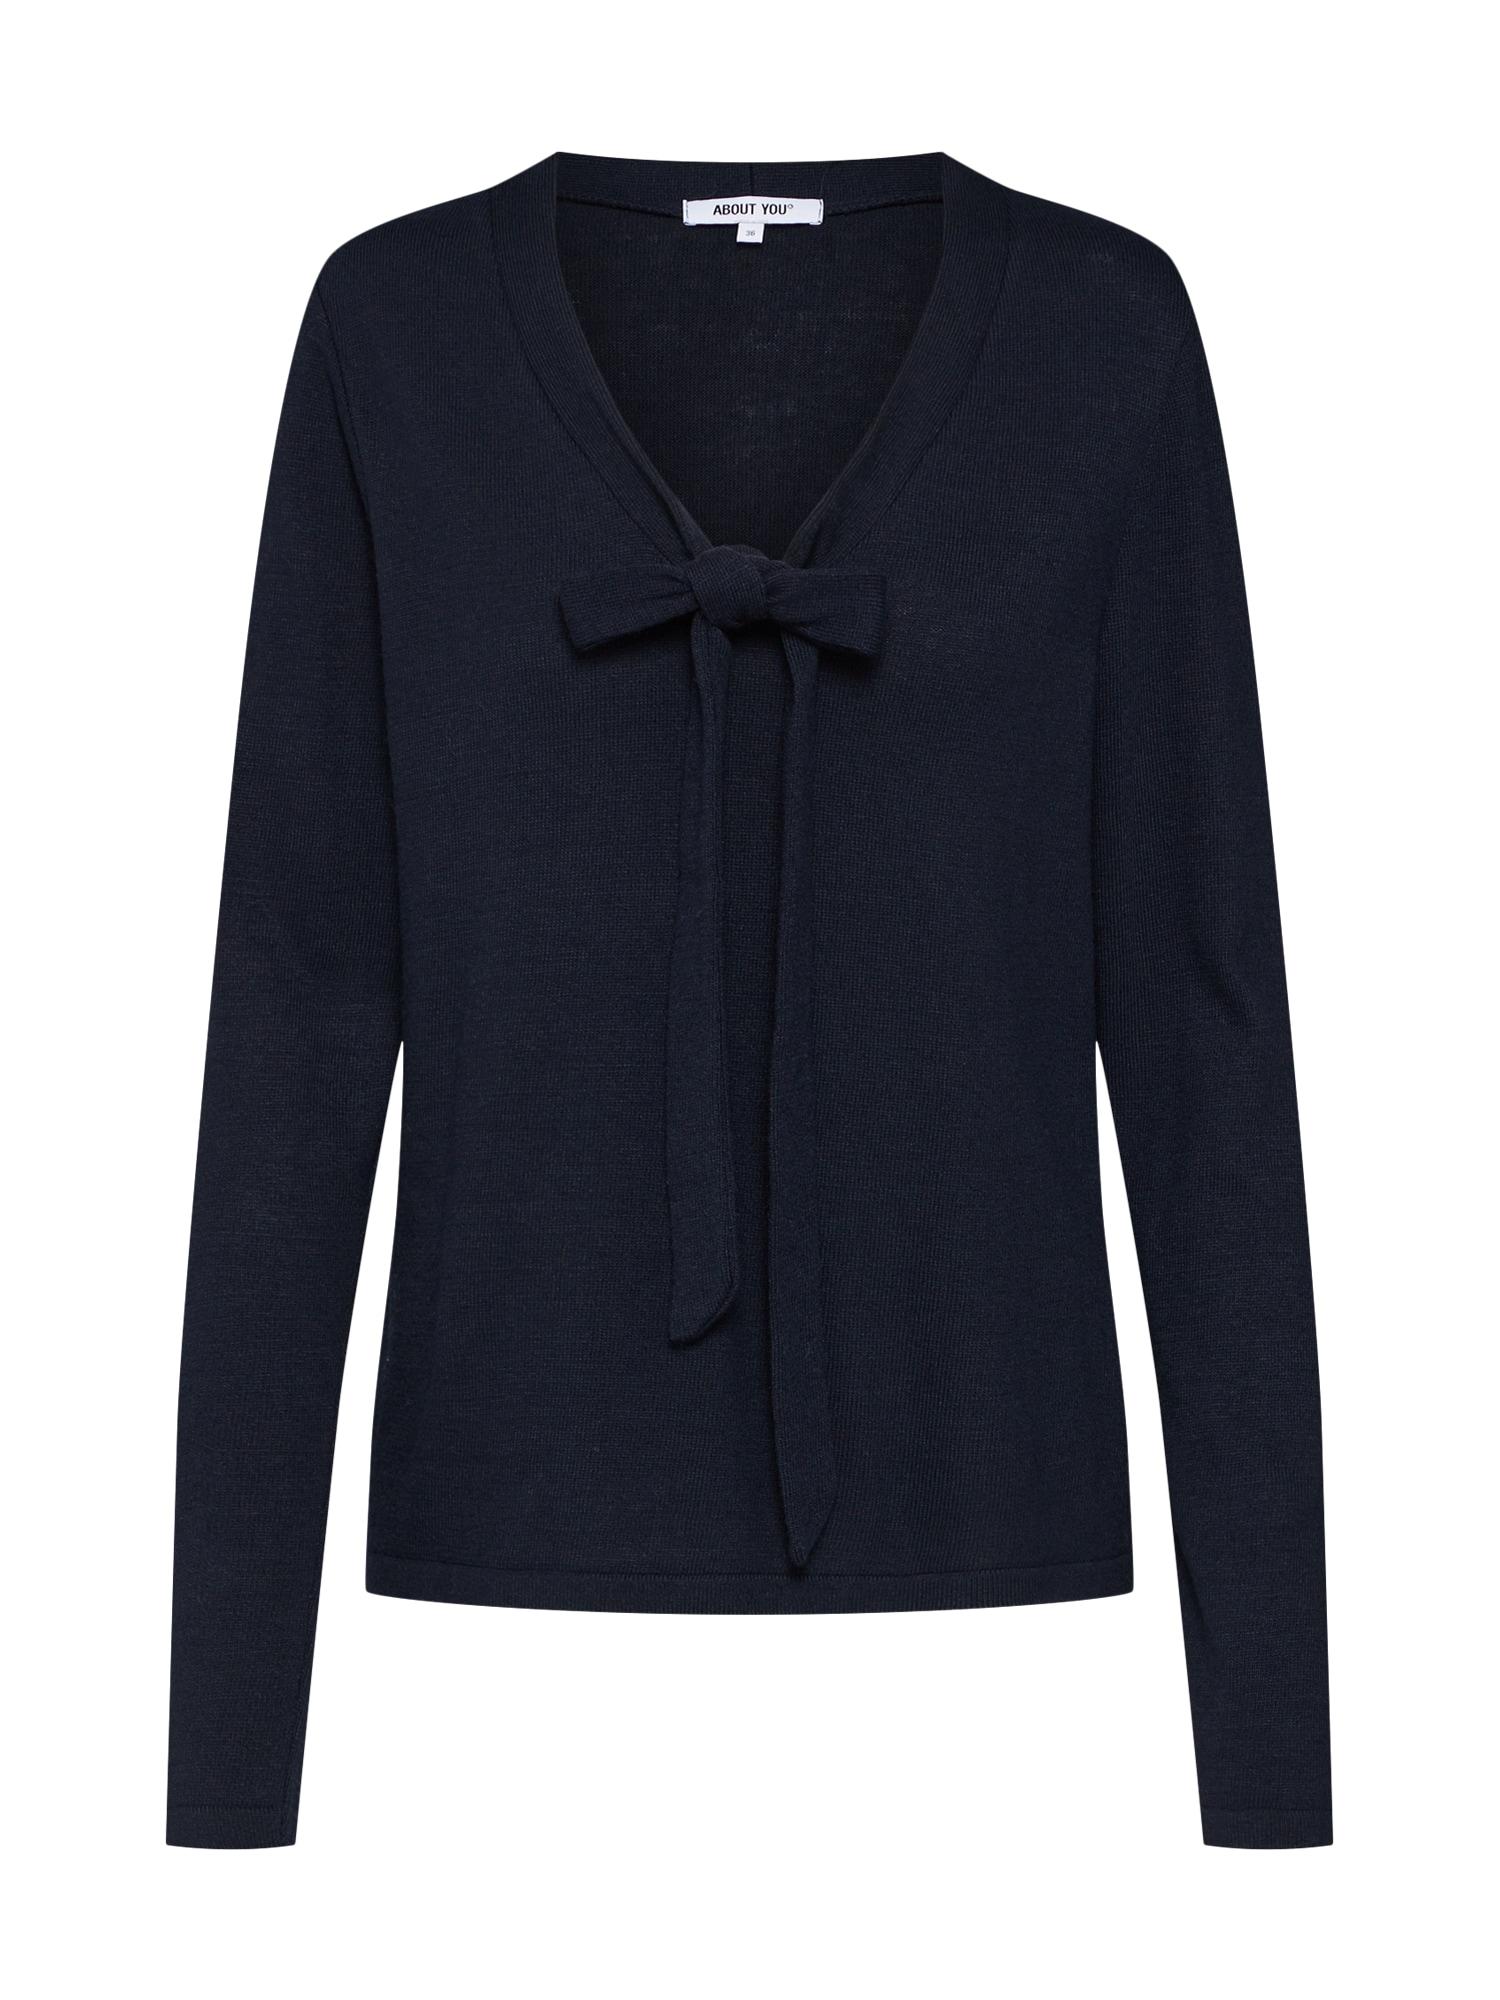 ABOUT YOU Megztinis 'Cosima' tamsiai mėlyna